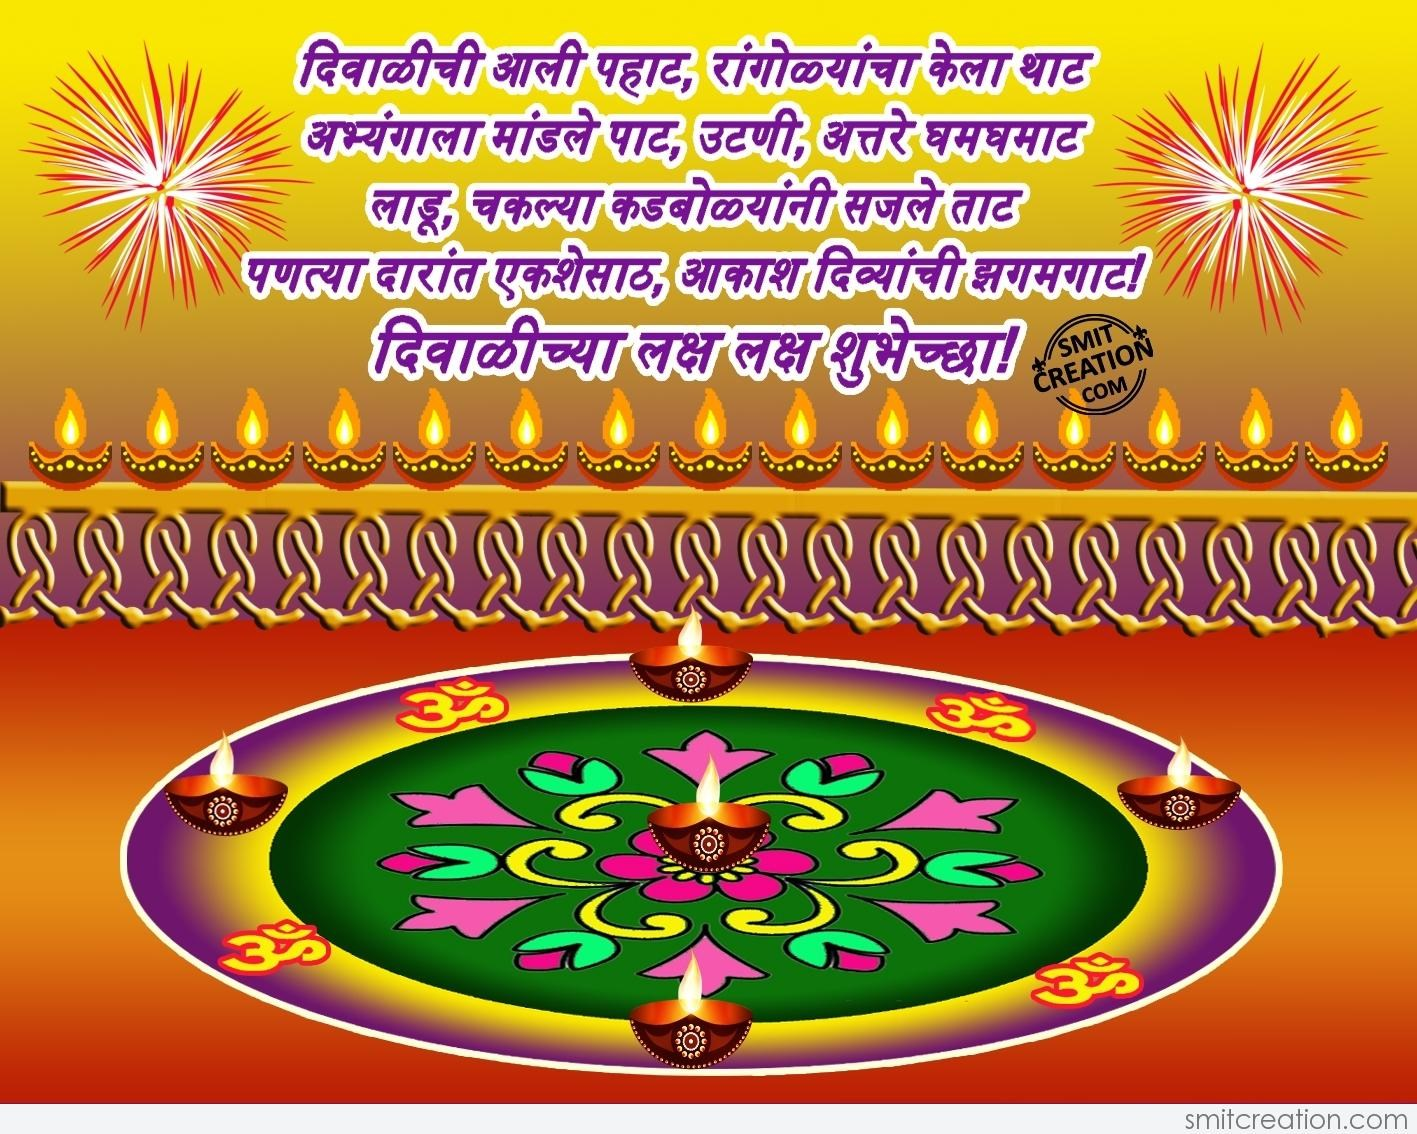 DIWALI CHYA HARDIK SHUBHECHHA - SmitCreation.com Vadhdivas Chya Hardik Shubhechha